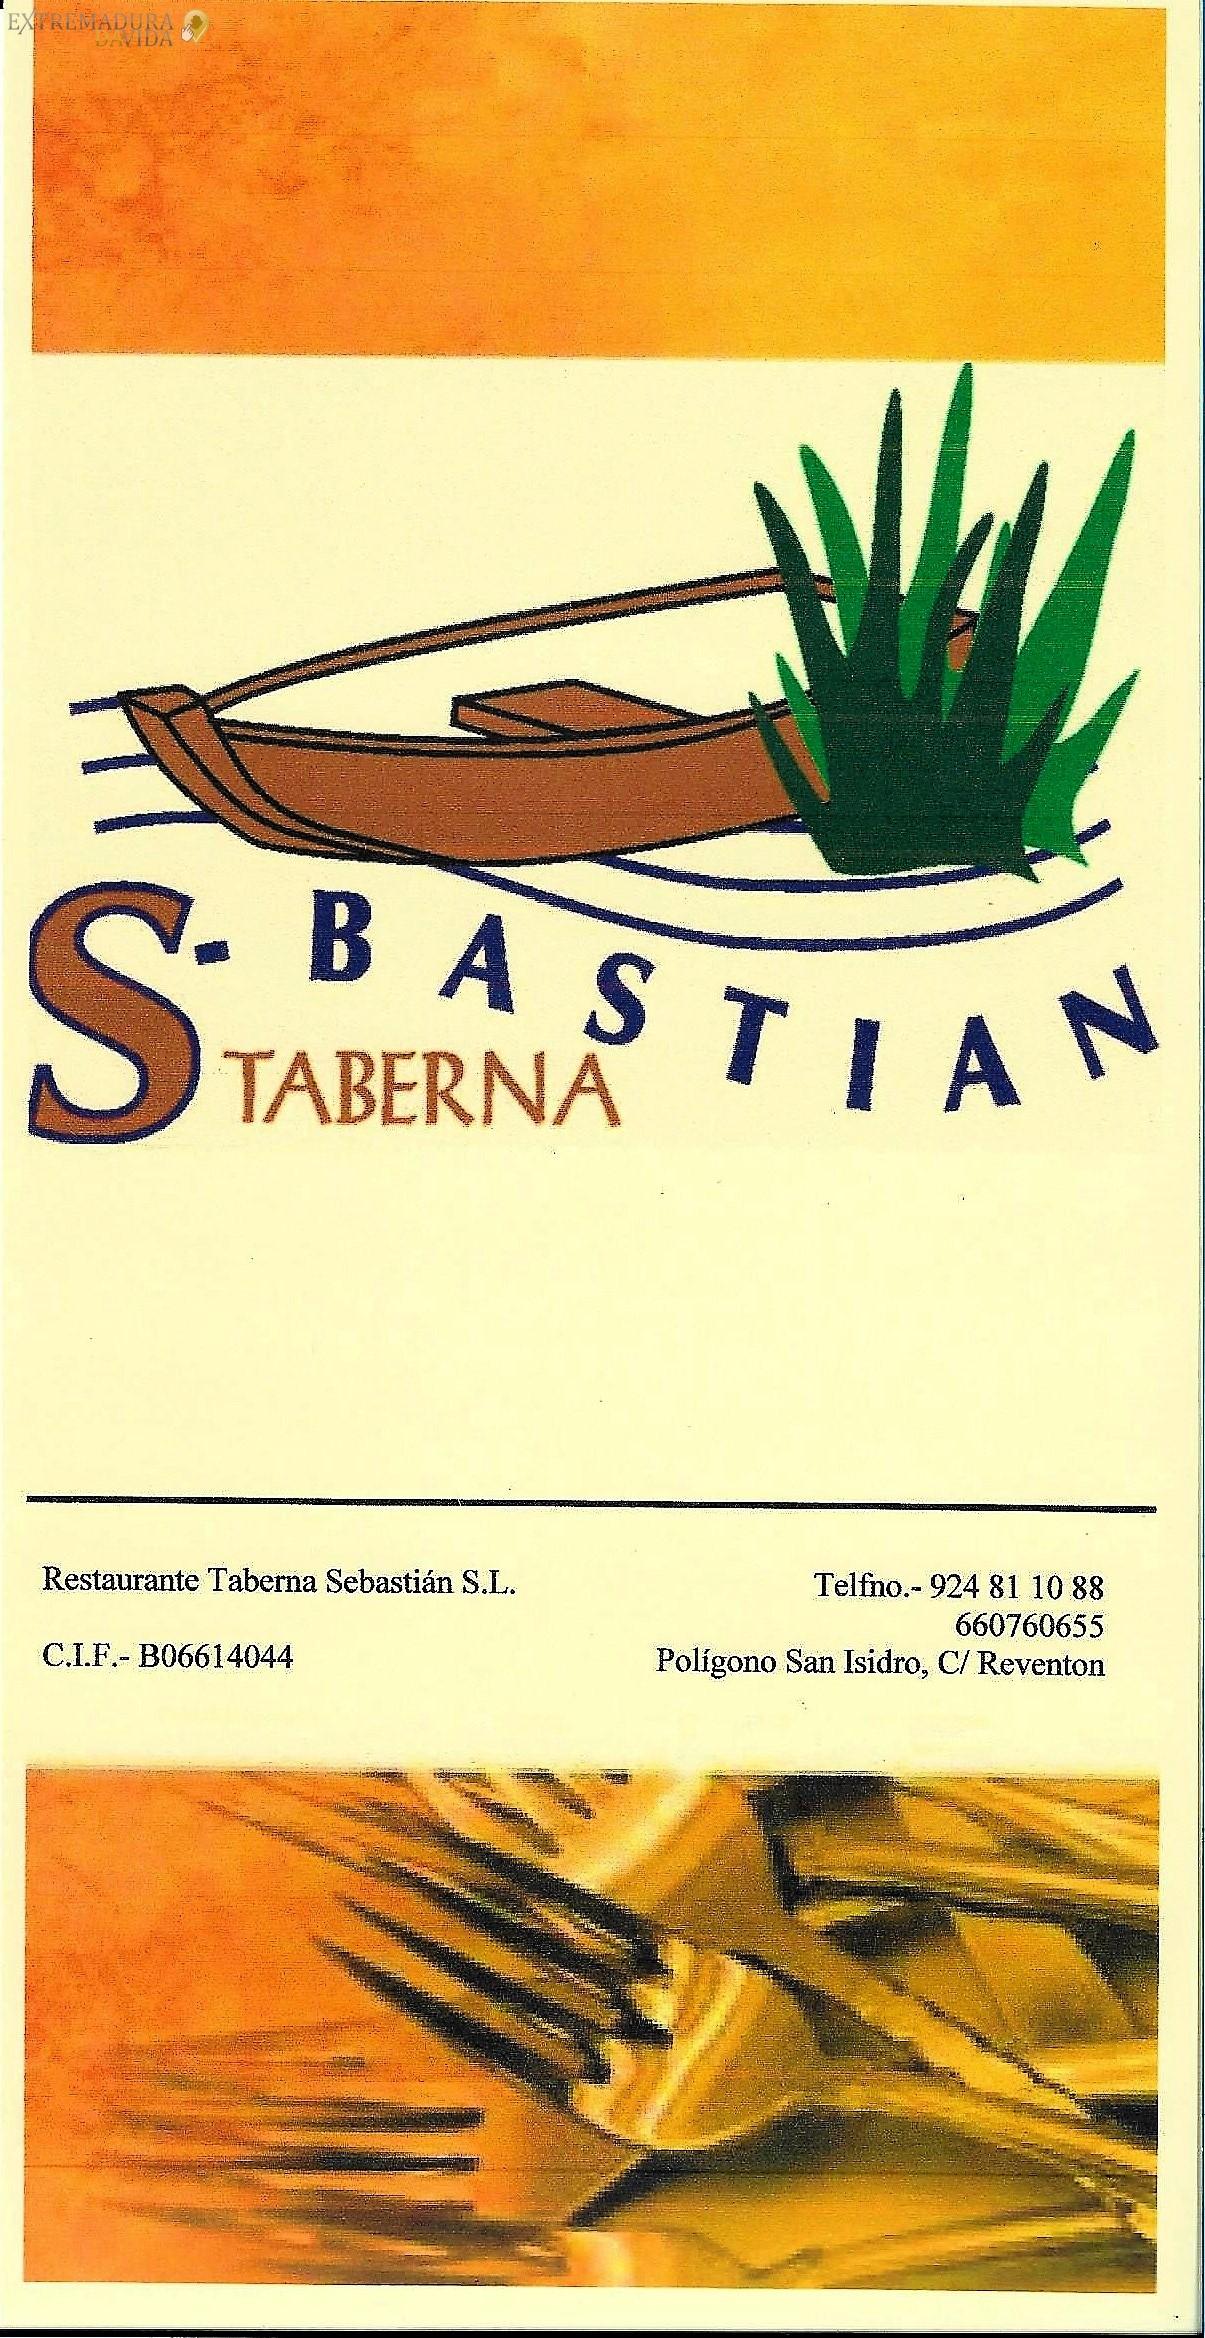 RESTAURANTE TABERNA DON BENITO SEBASTIAN